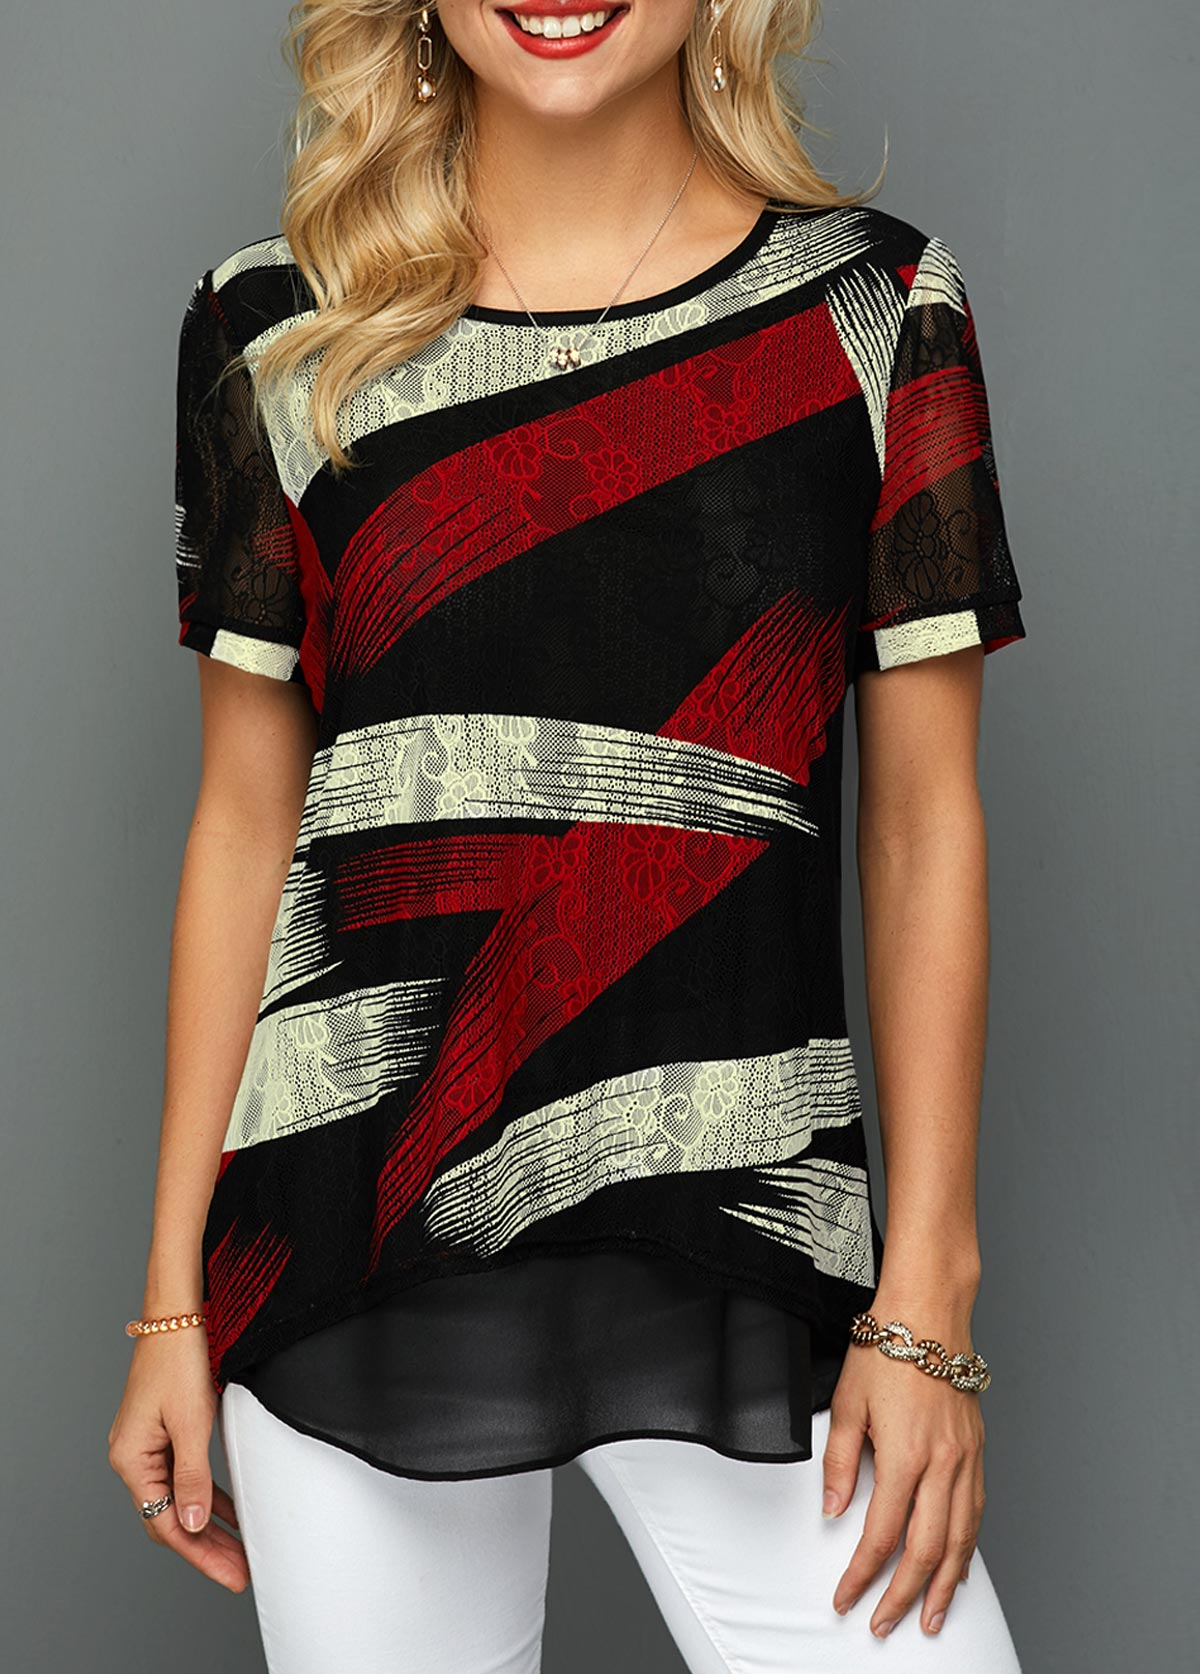 Short Sleeve Curved Hem Lace T Shirt